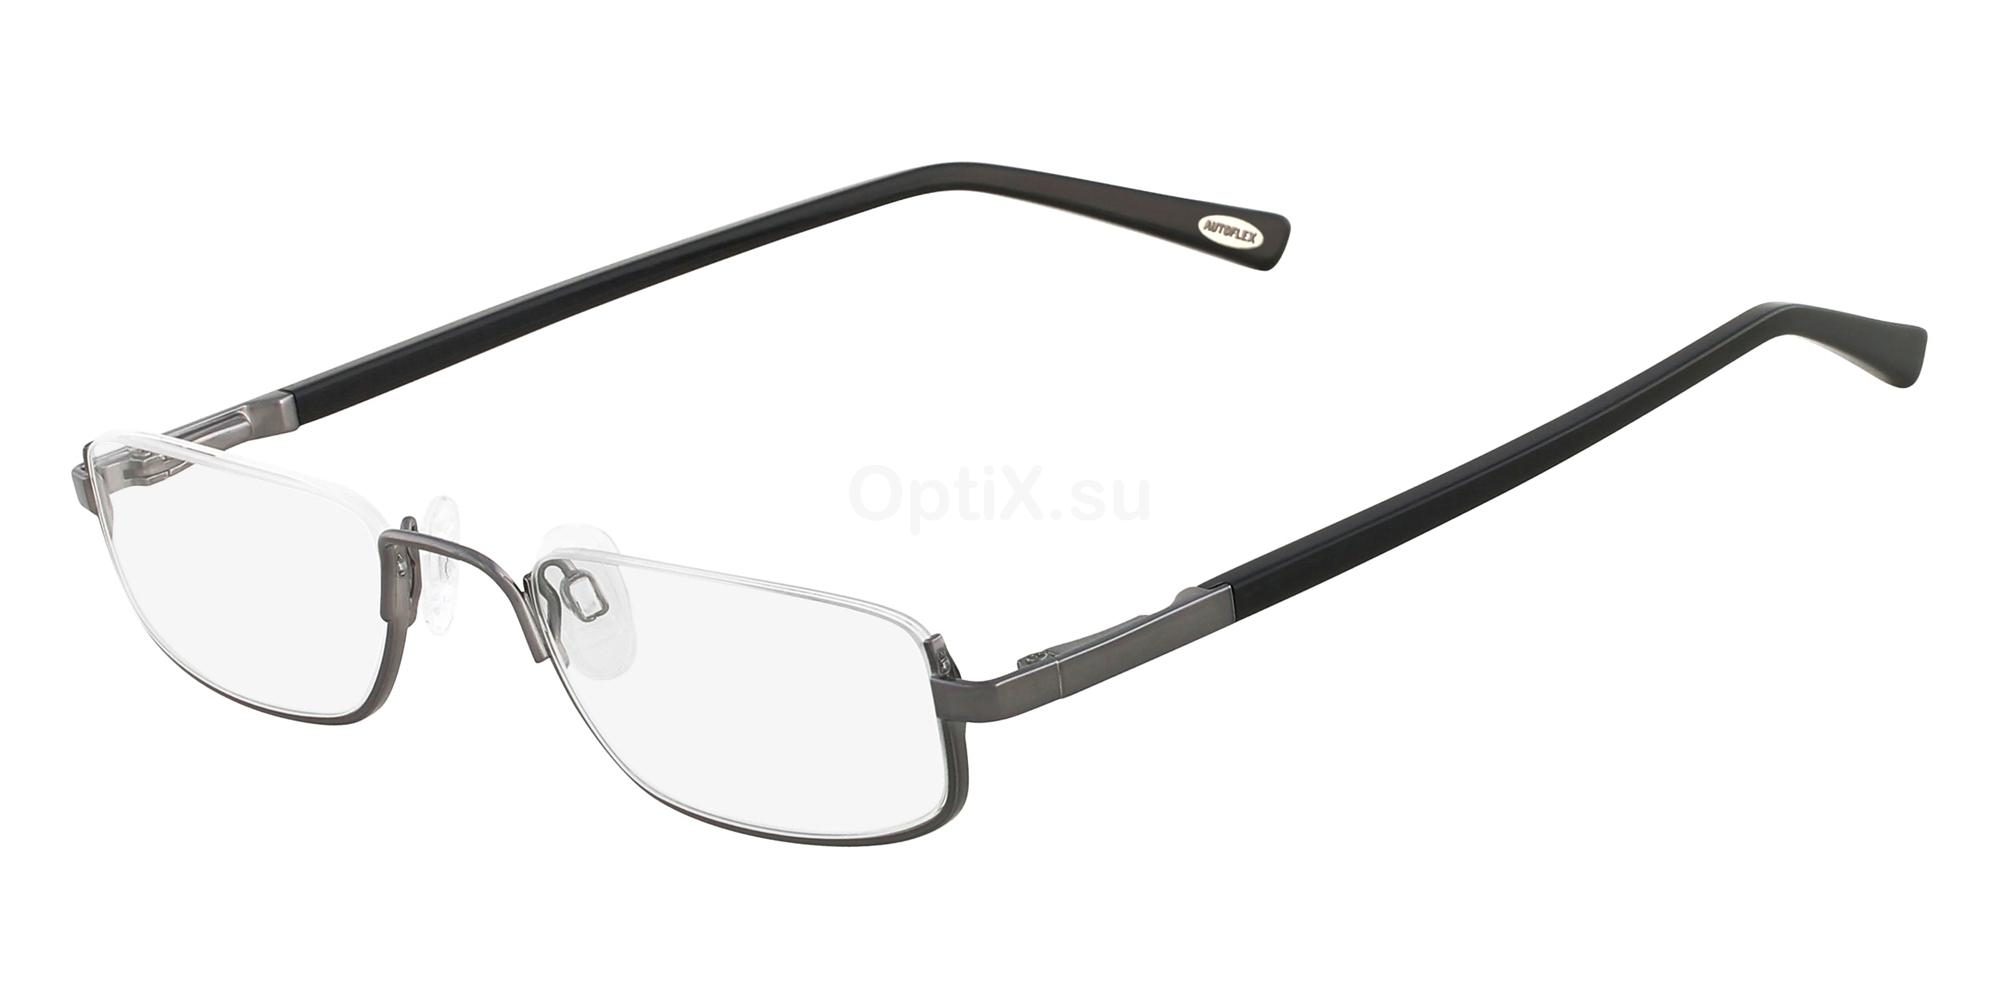 033 AUTOFLEX DR. ROBERT Glasses, Flexon